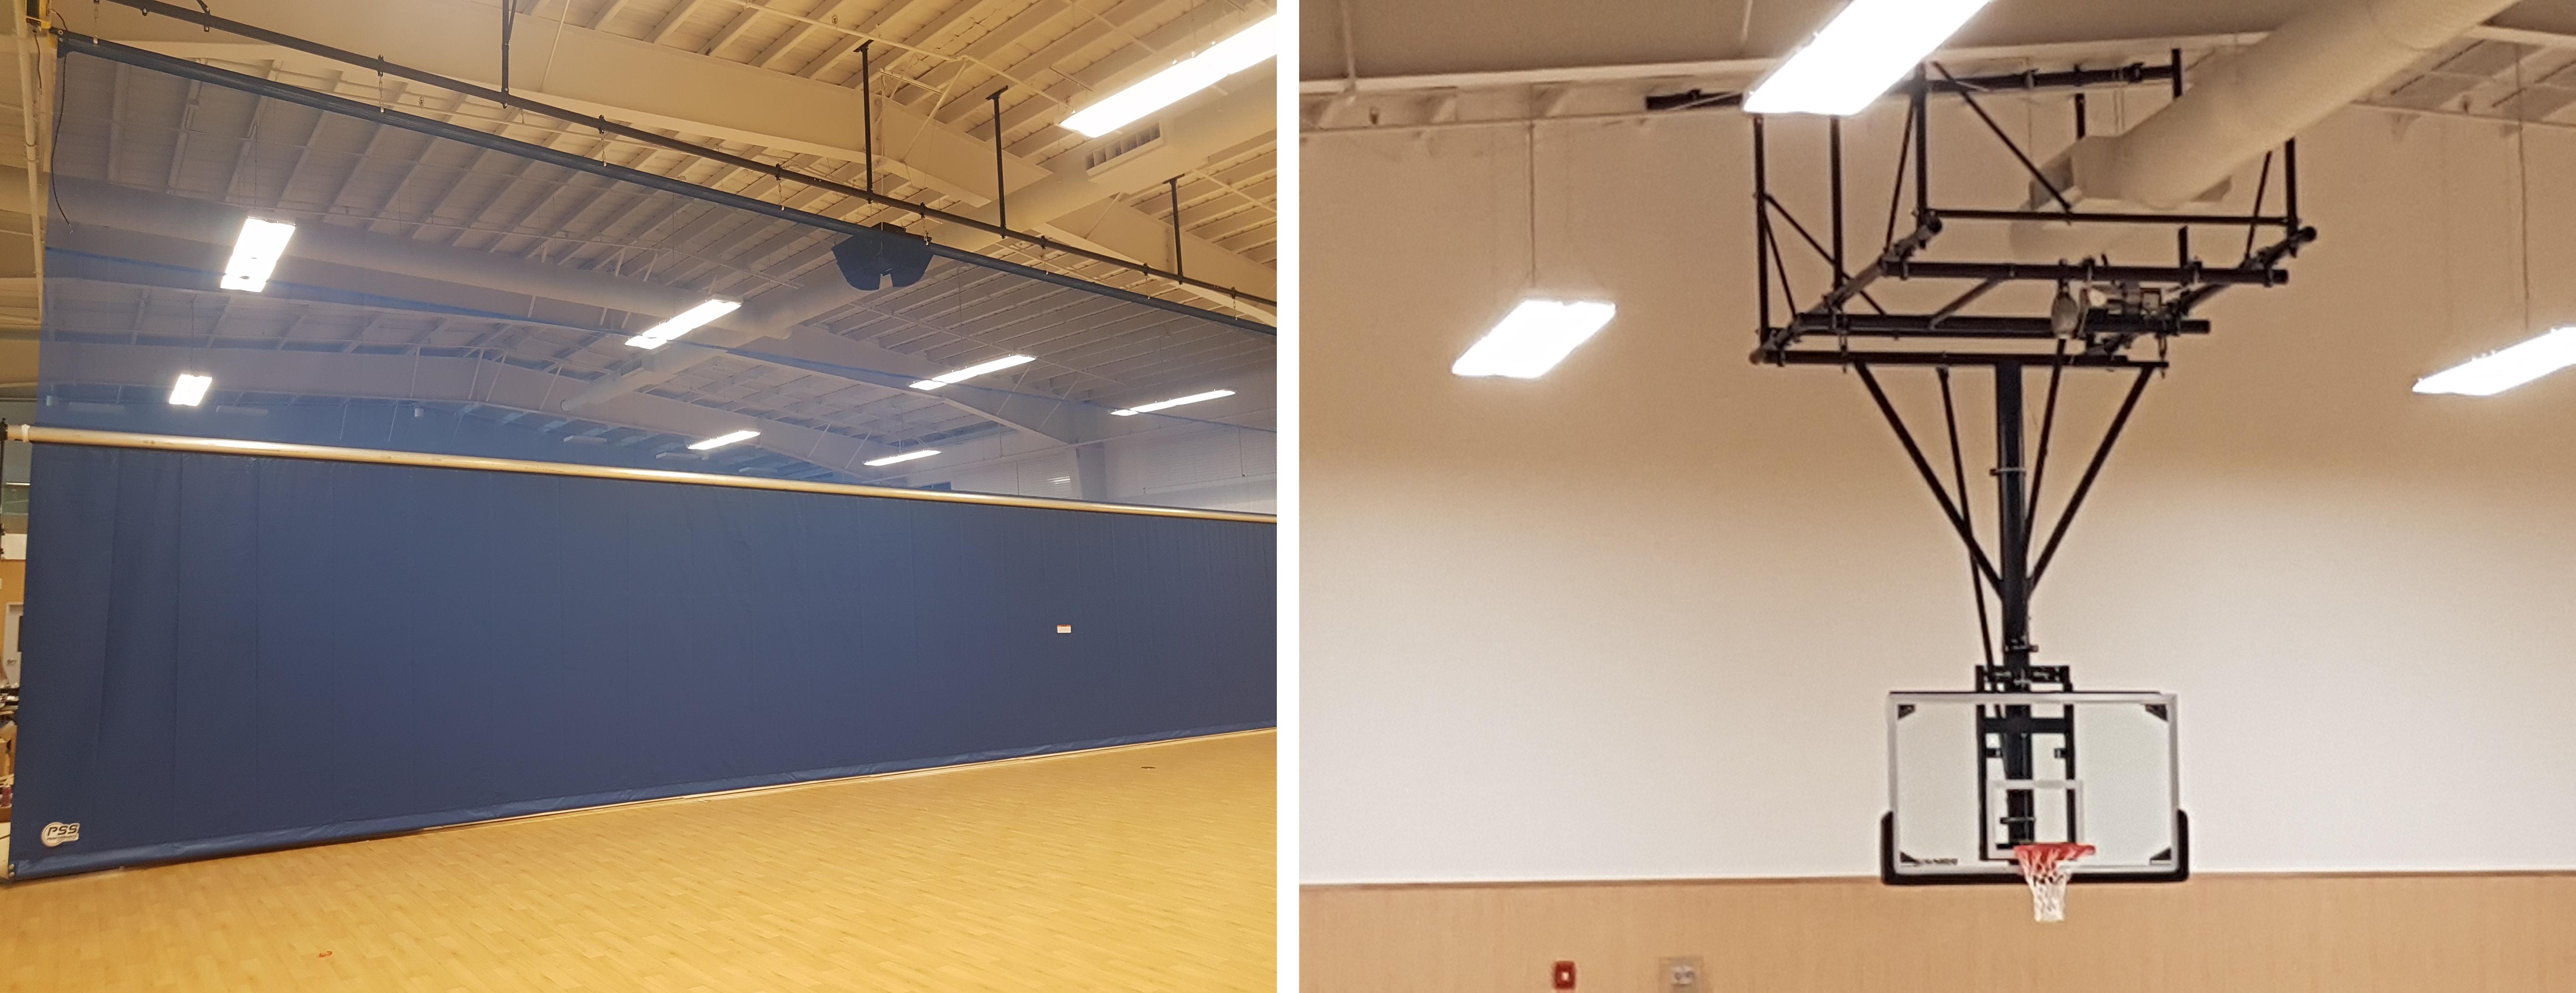 gym-divider-curtain-basketball-system-khon-go-cho-complex.png